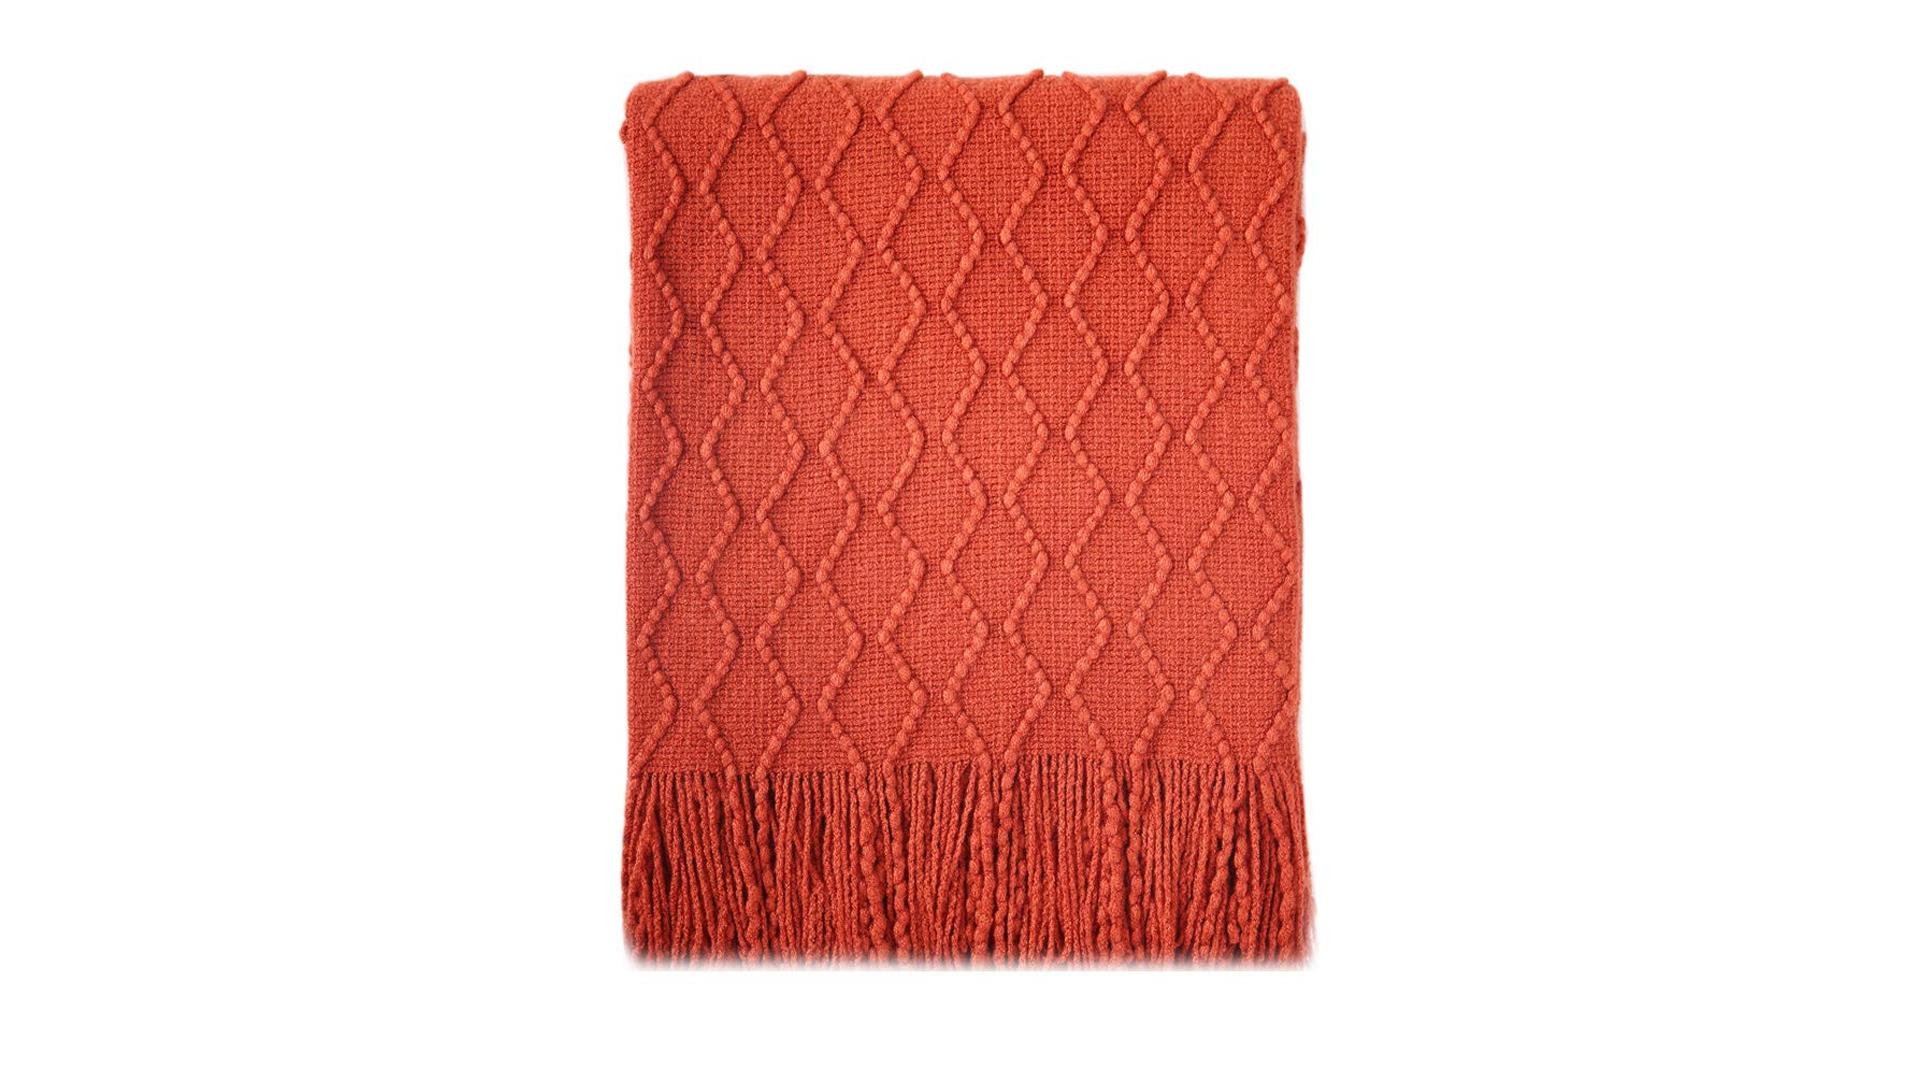 The BOURINA textured throw blanket.